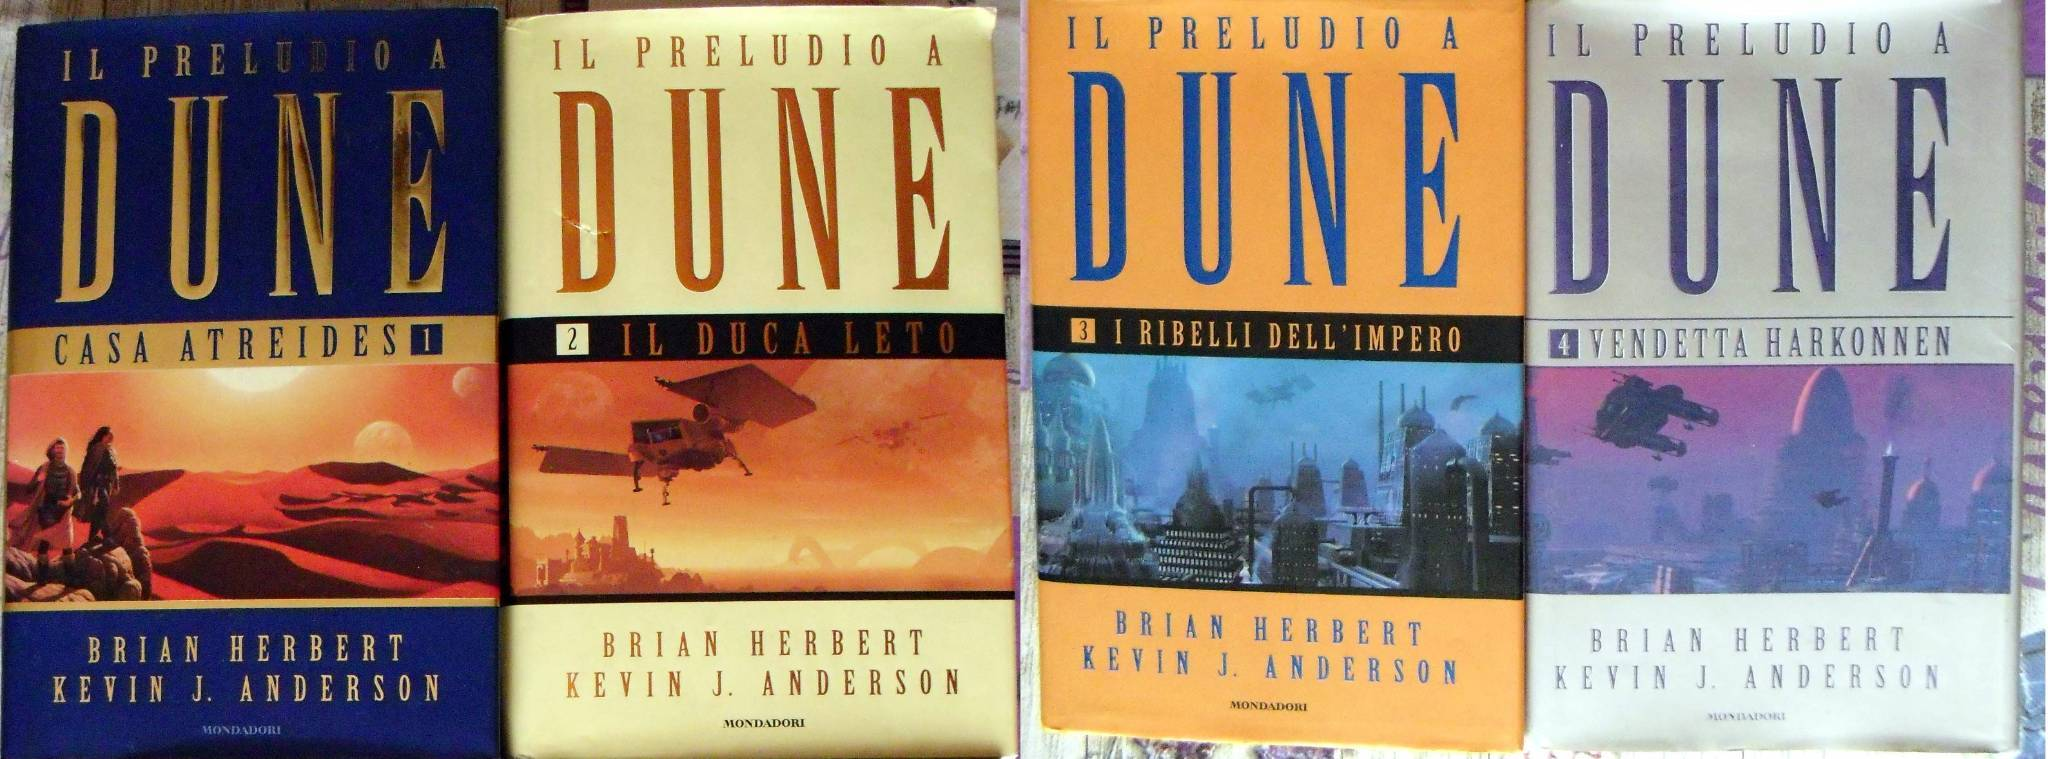 I preludi a Dune